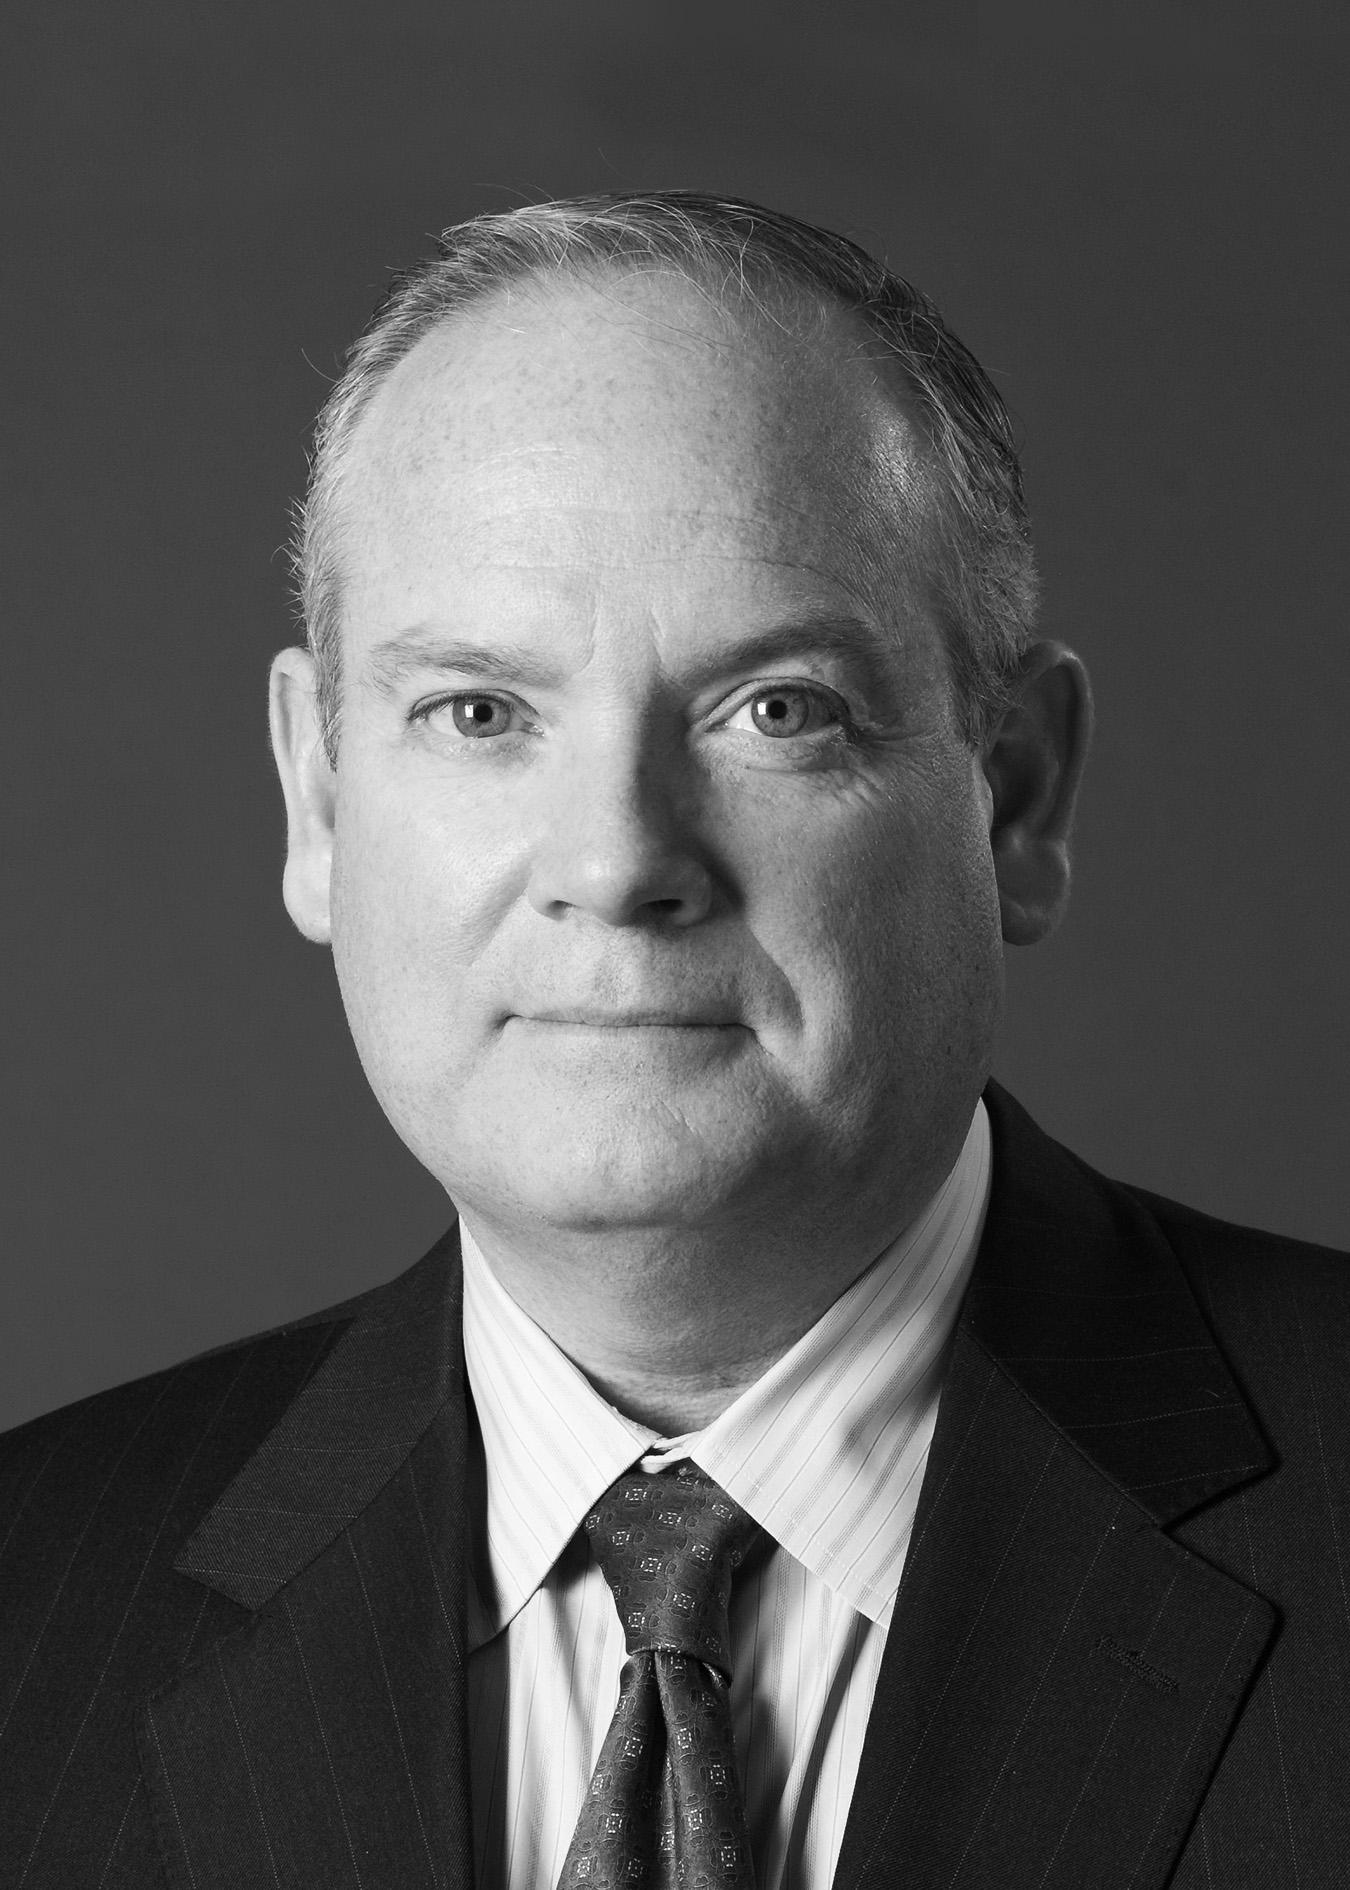 David C. Dobson